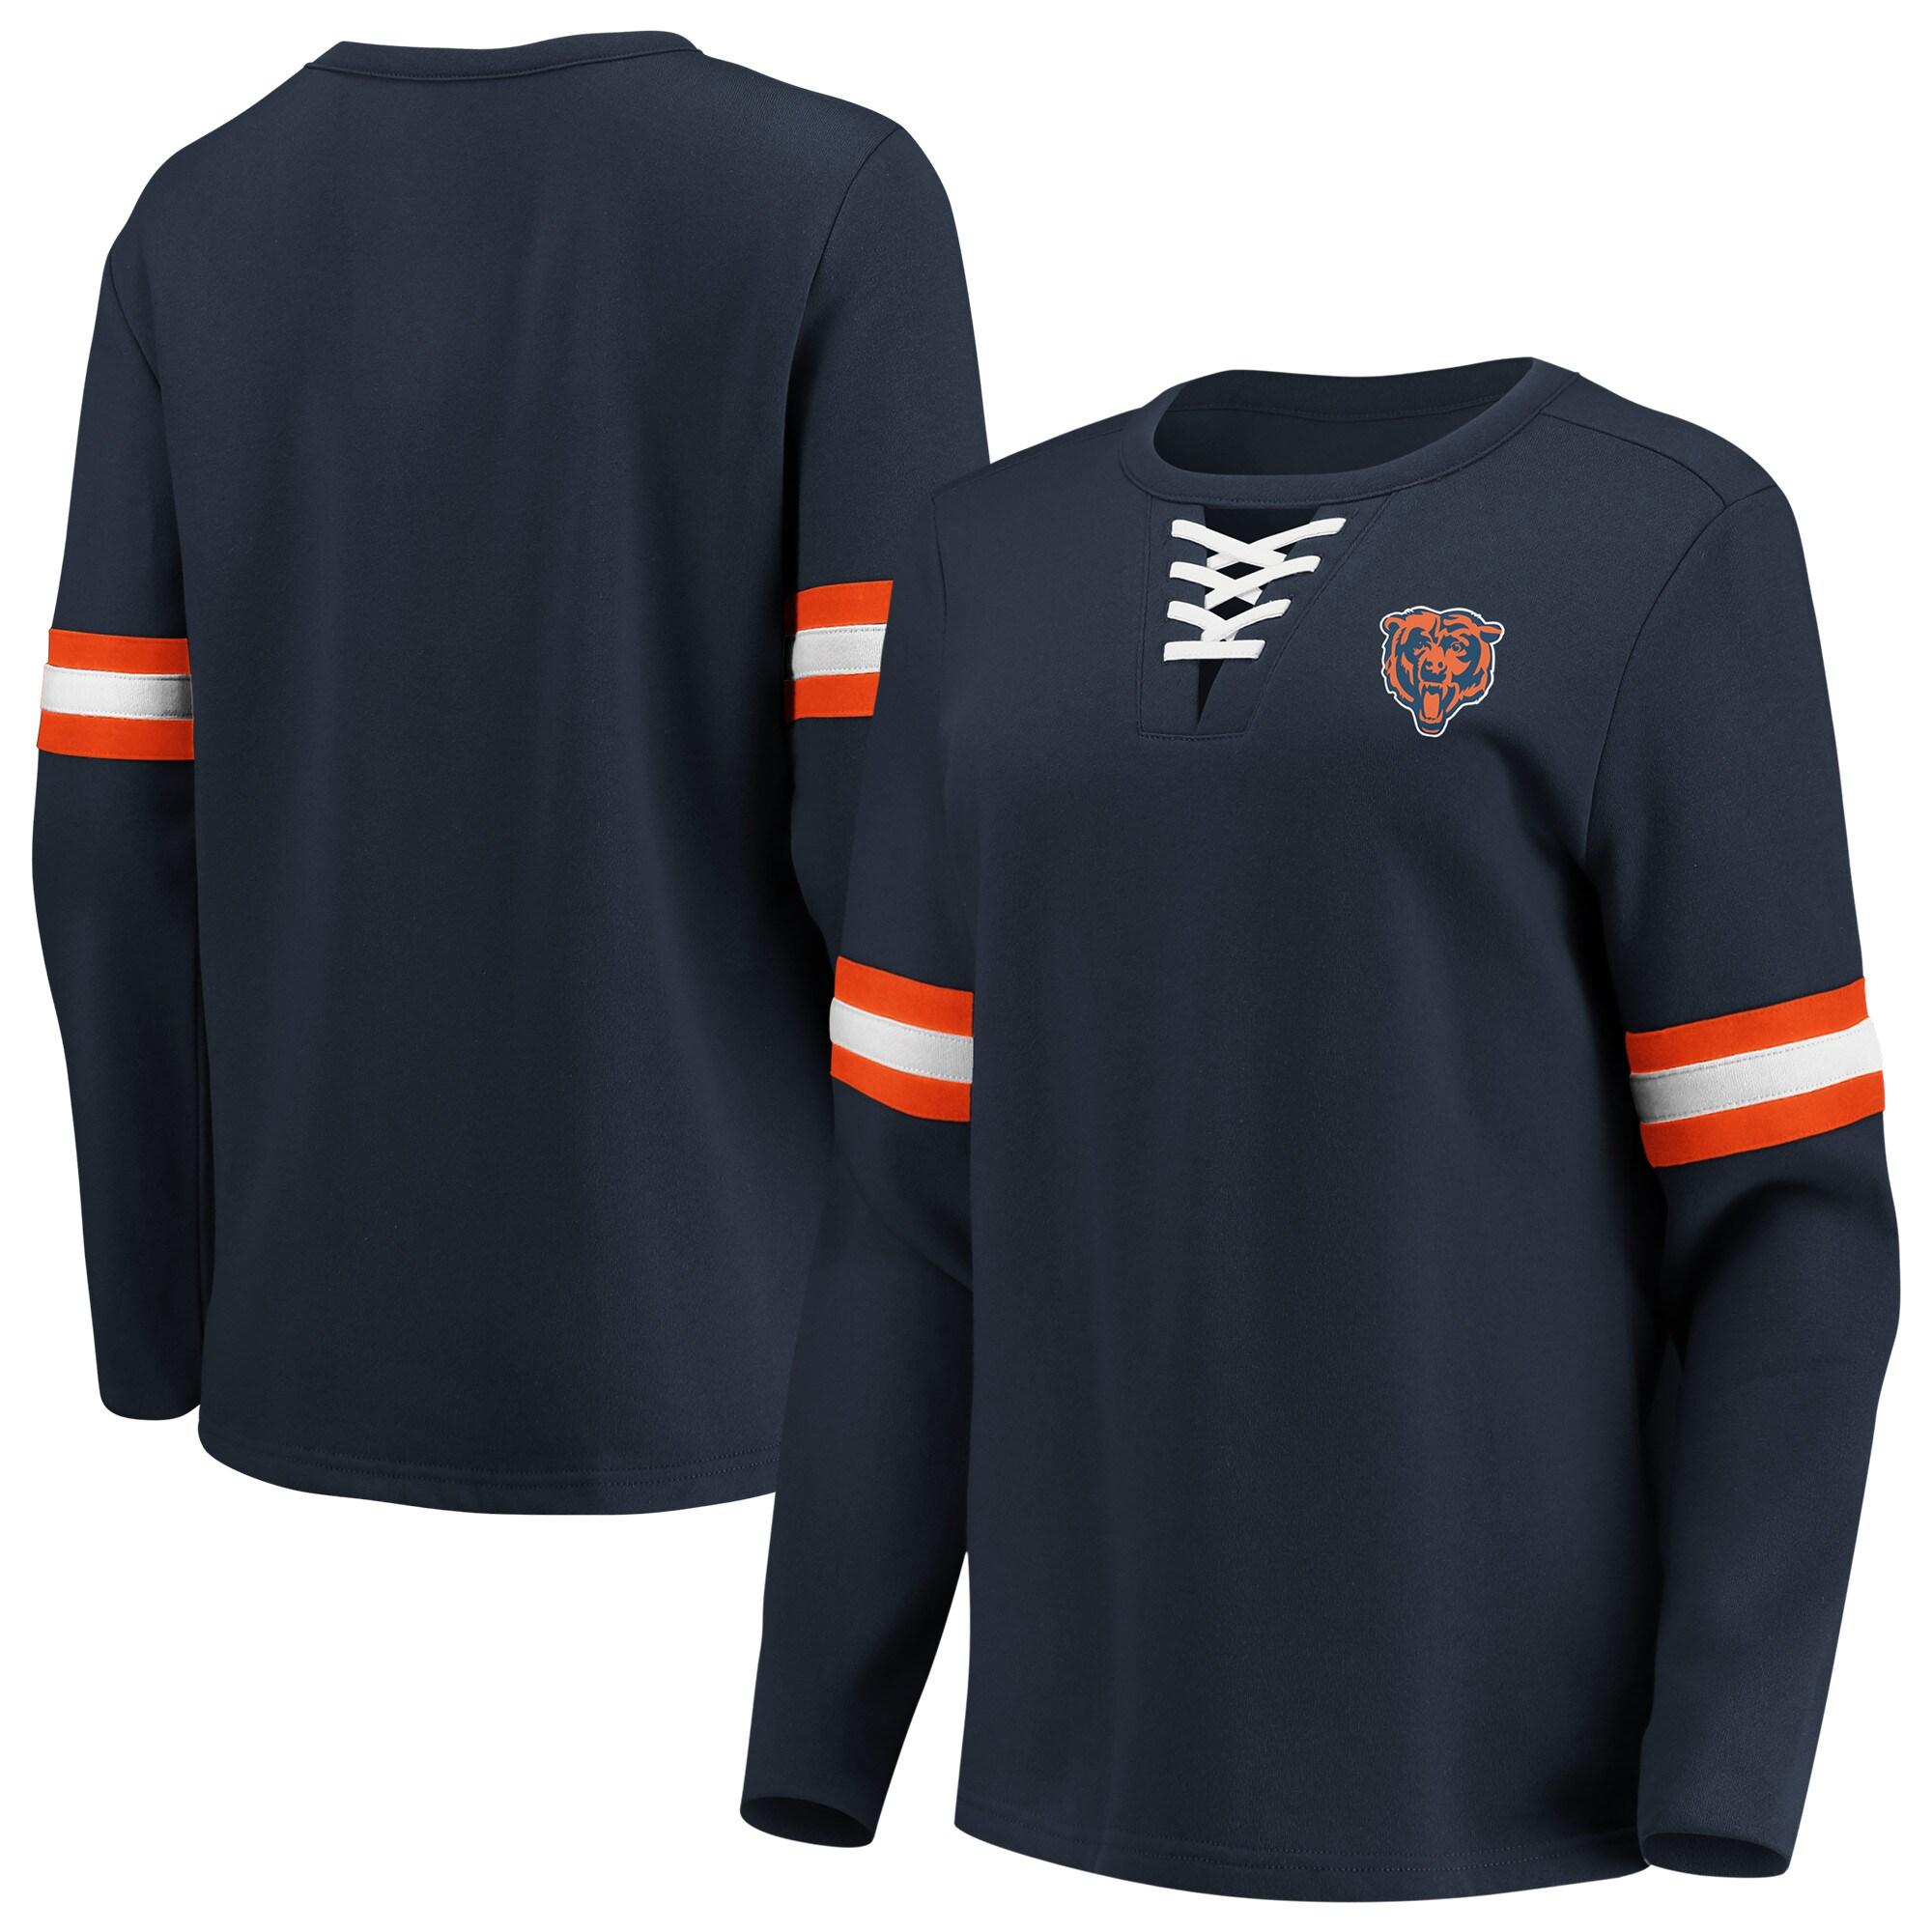 Chicago Bears Fanatics Branded Women's Lead Draft Lace-Up Pullover Fleece Sweatshirt - Navy